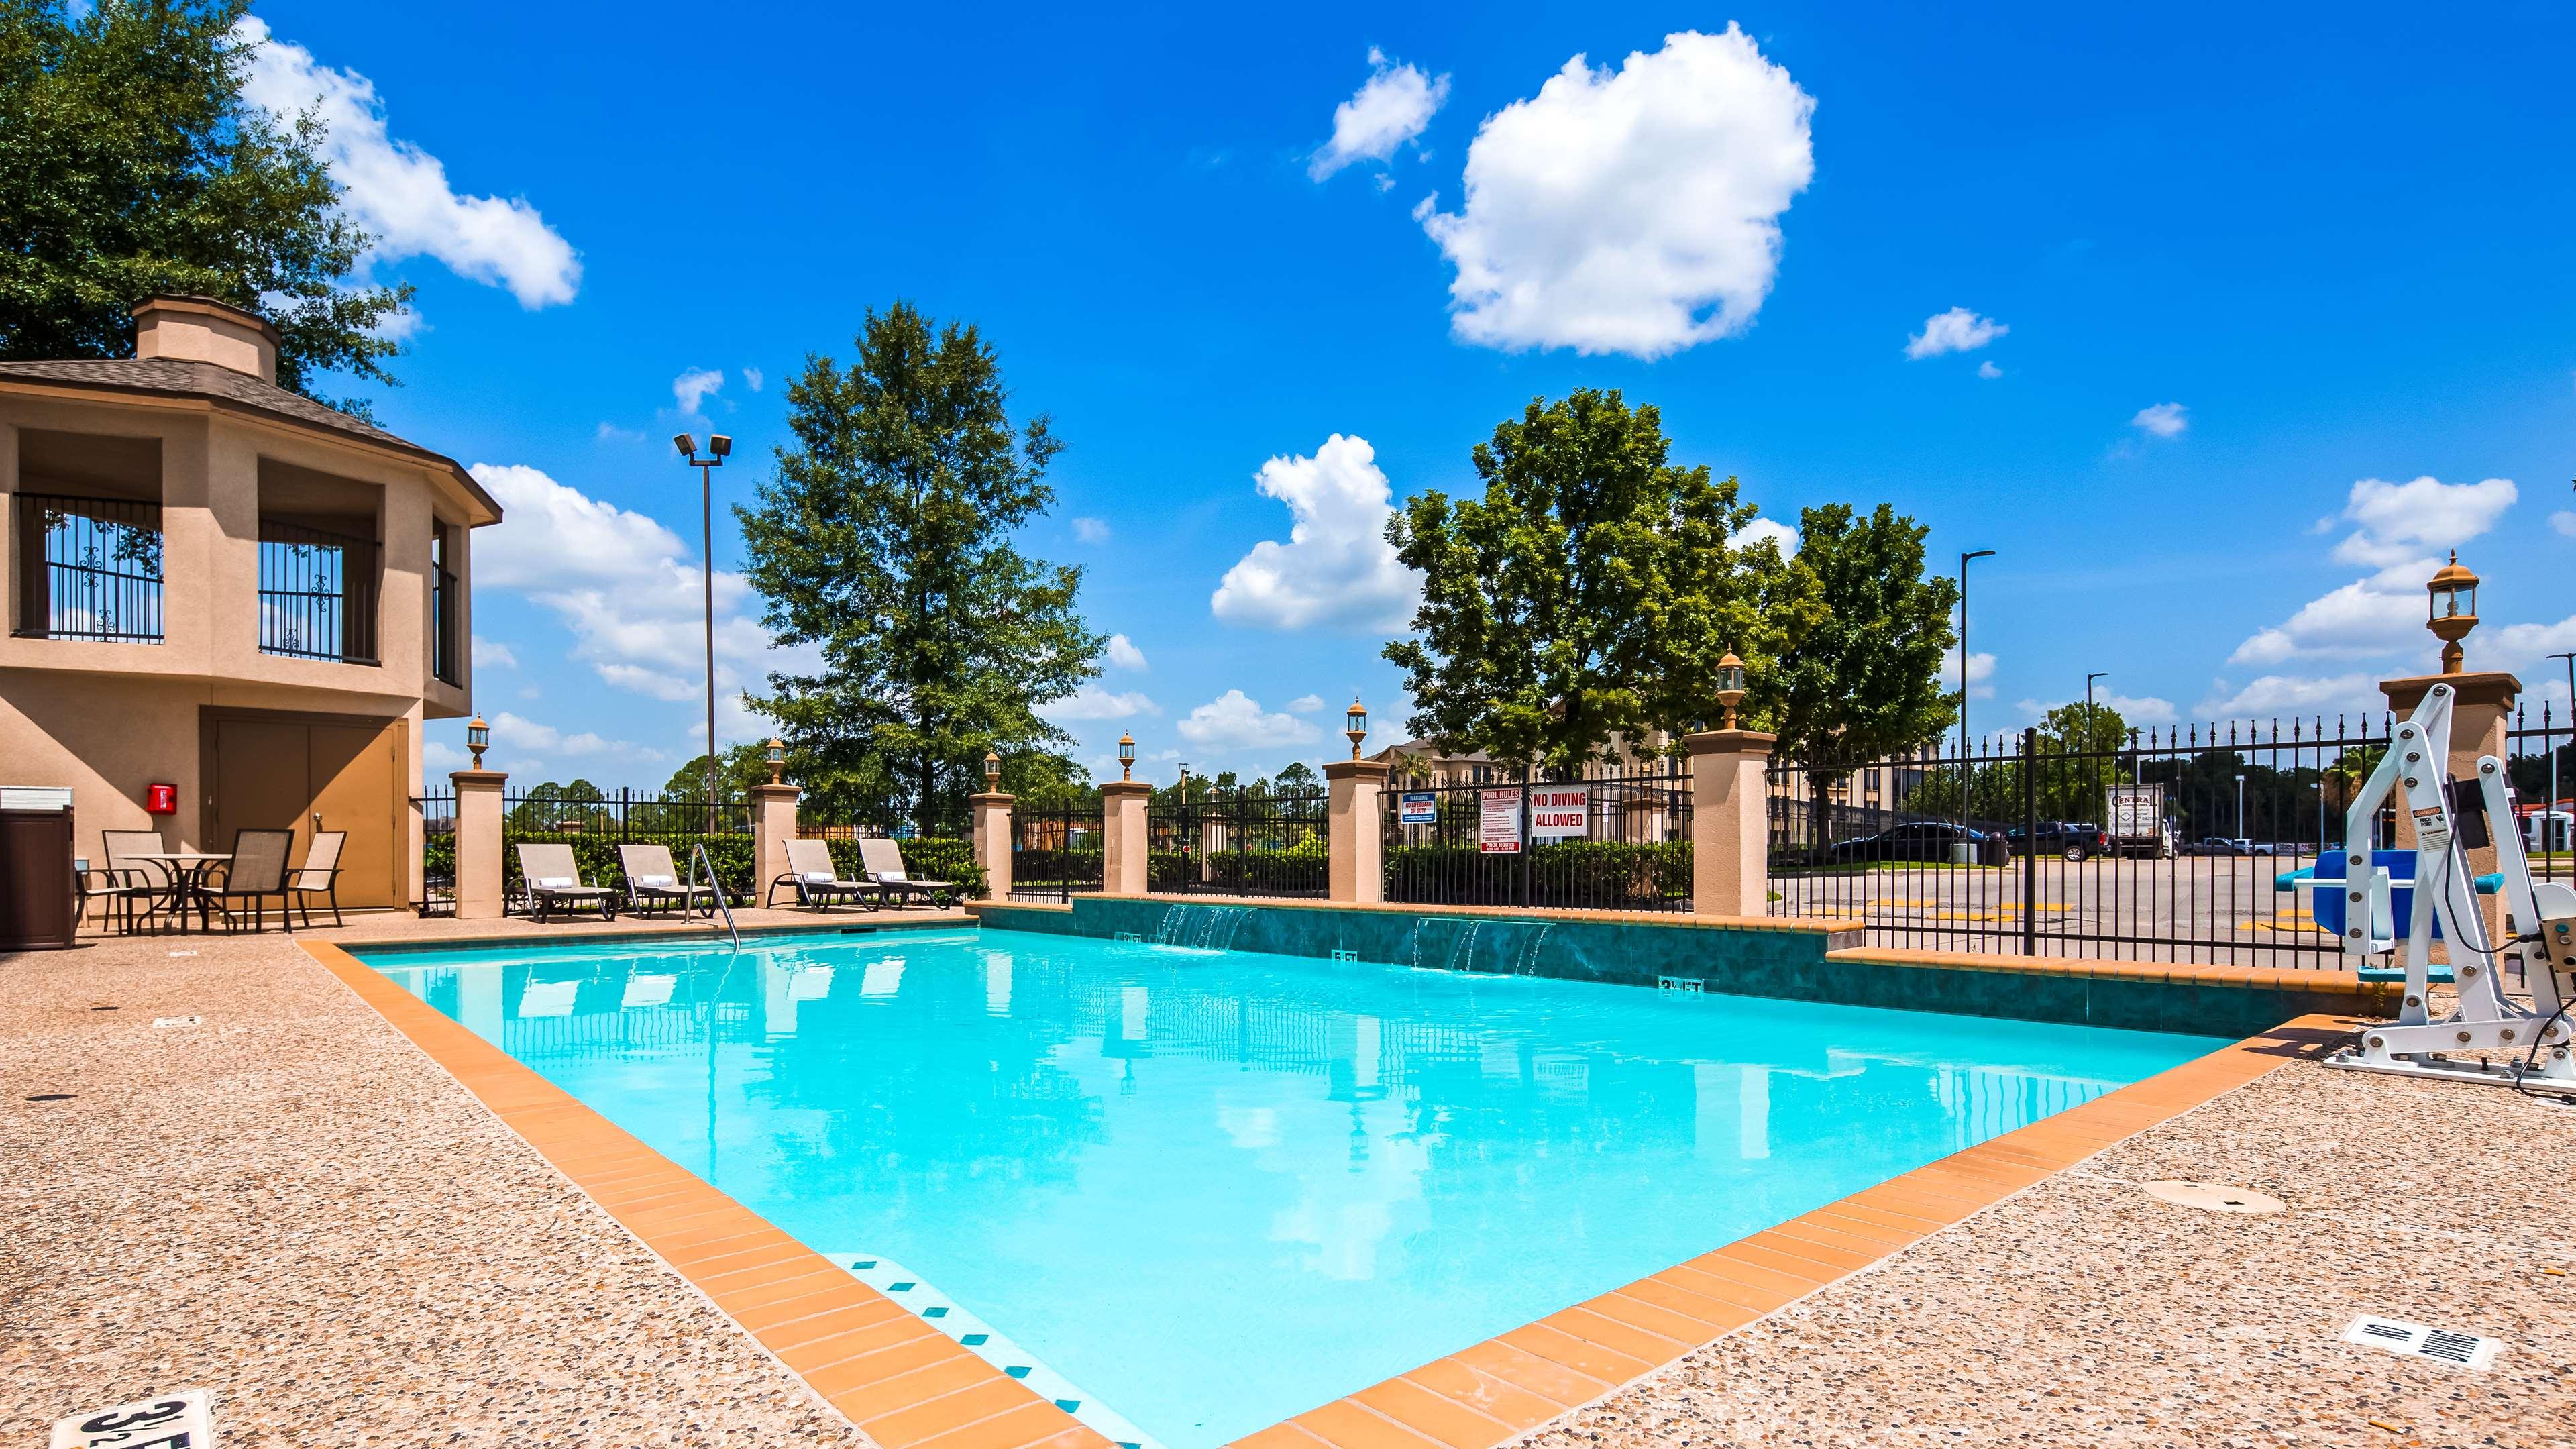 Best Western Plus North Houston Inn & Suites image 36